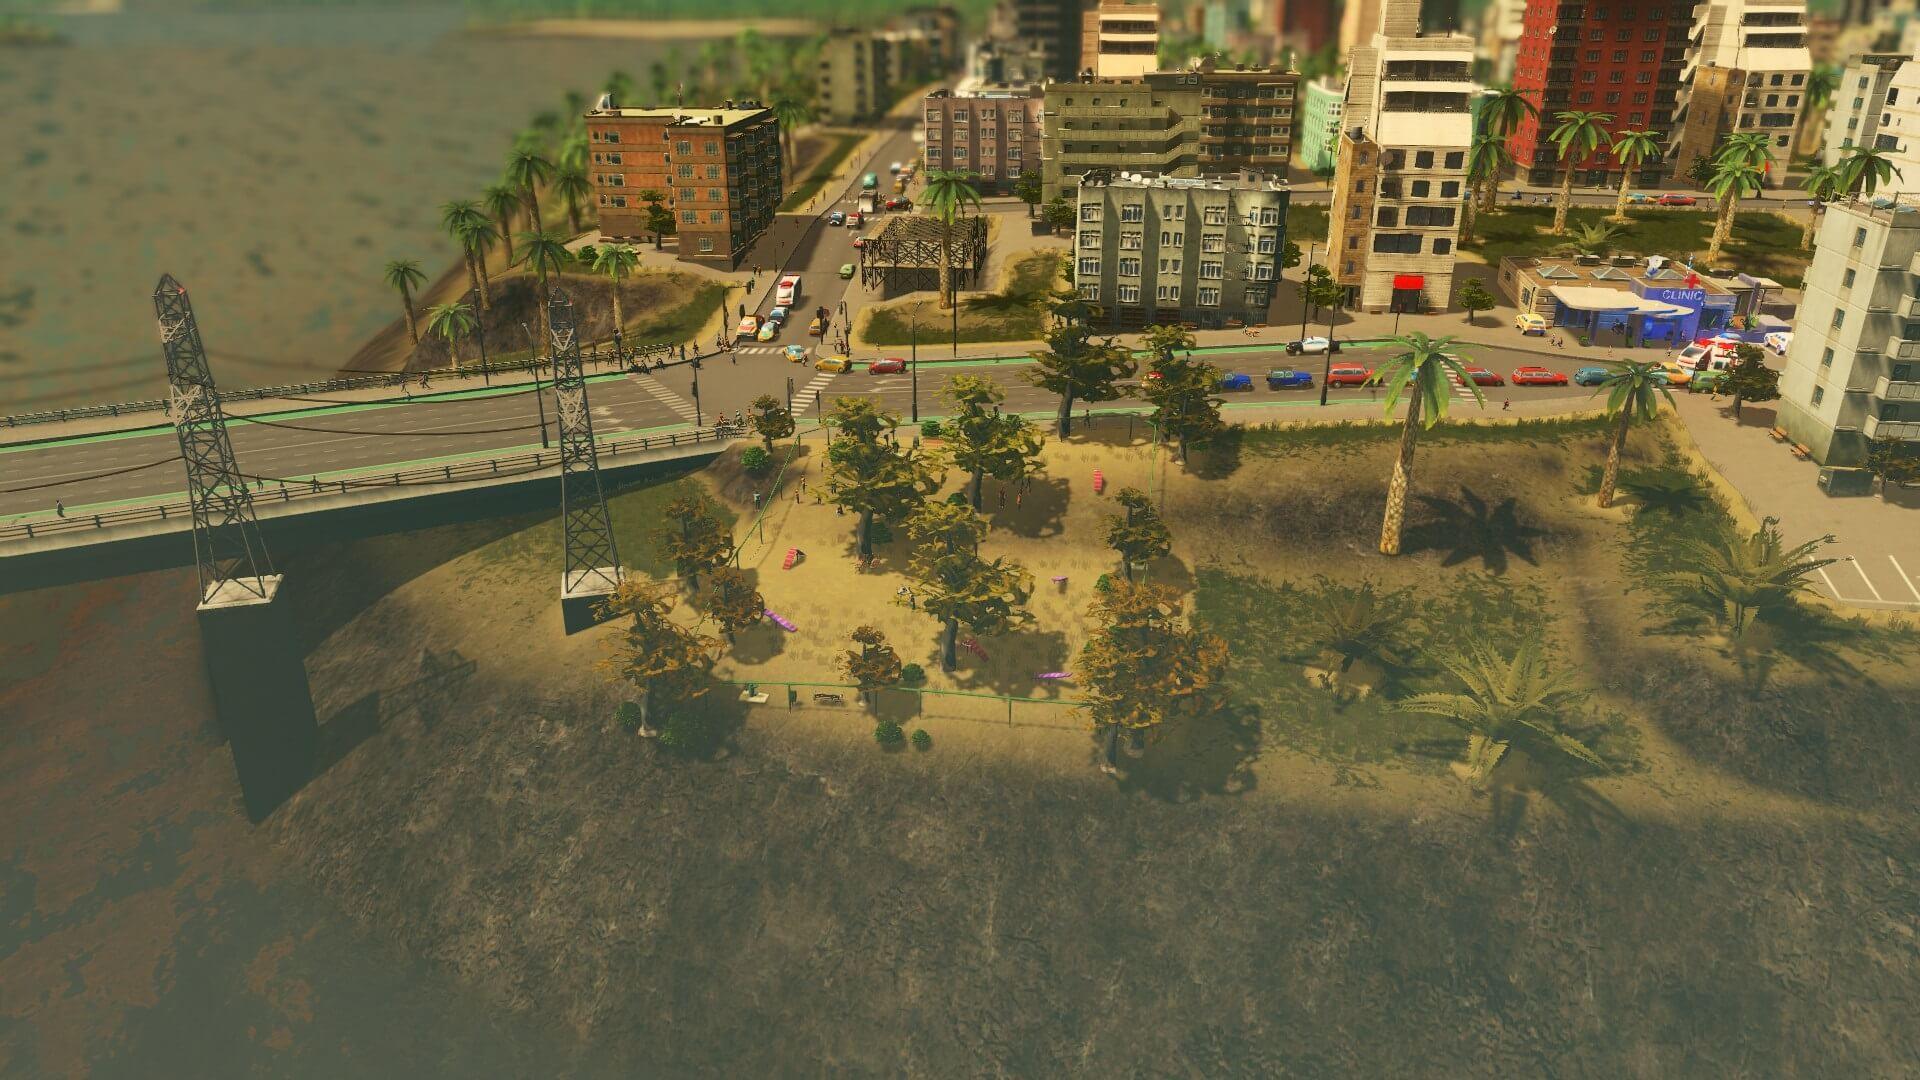 Cities:skylines 電線設置のために建築されたドッグパーク